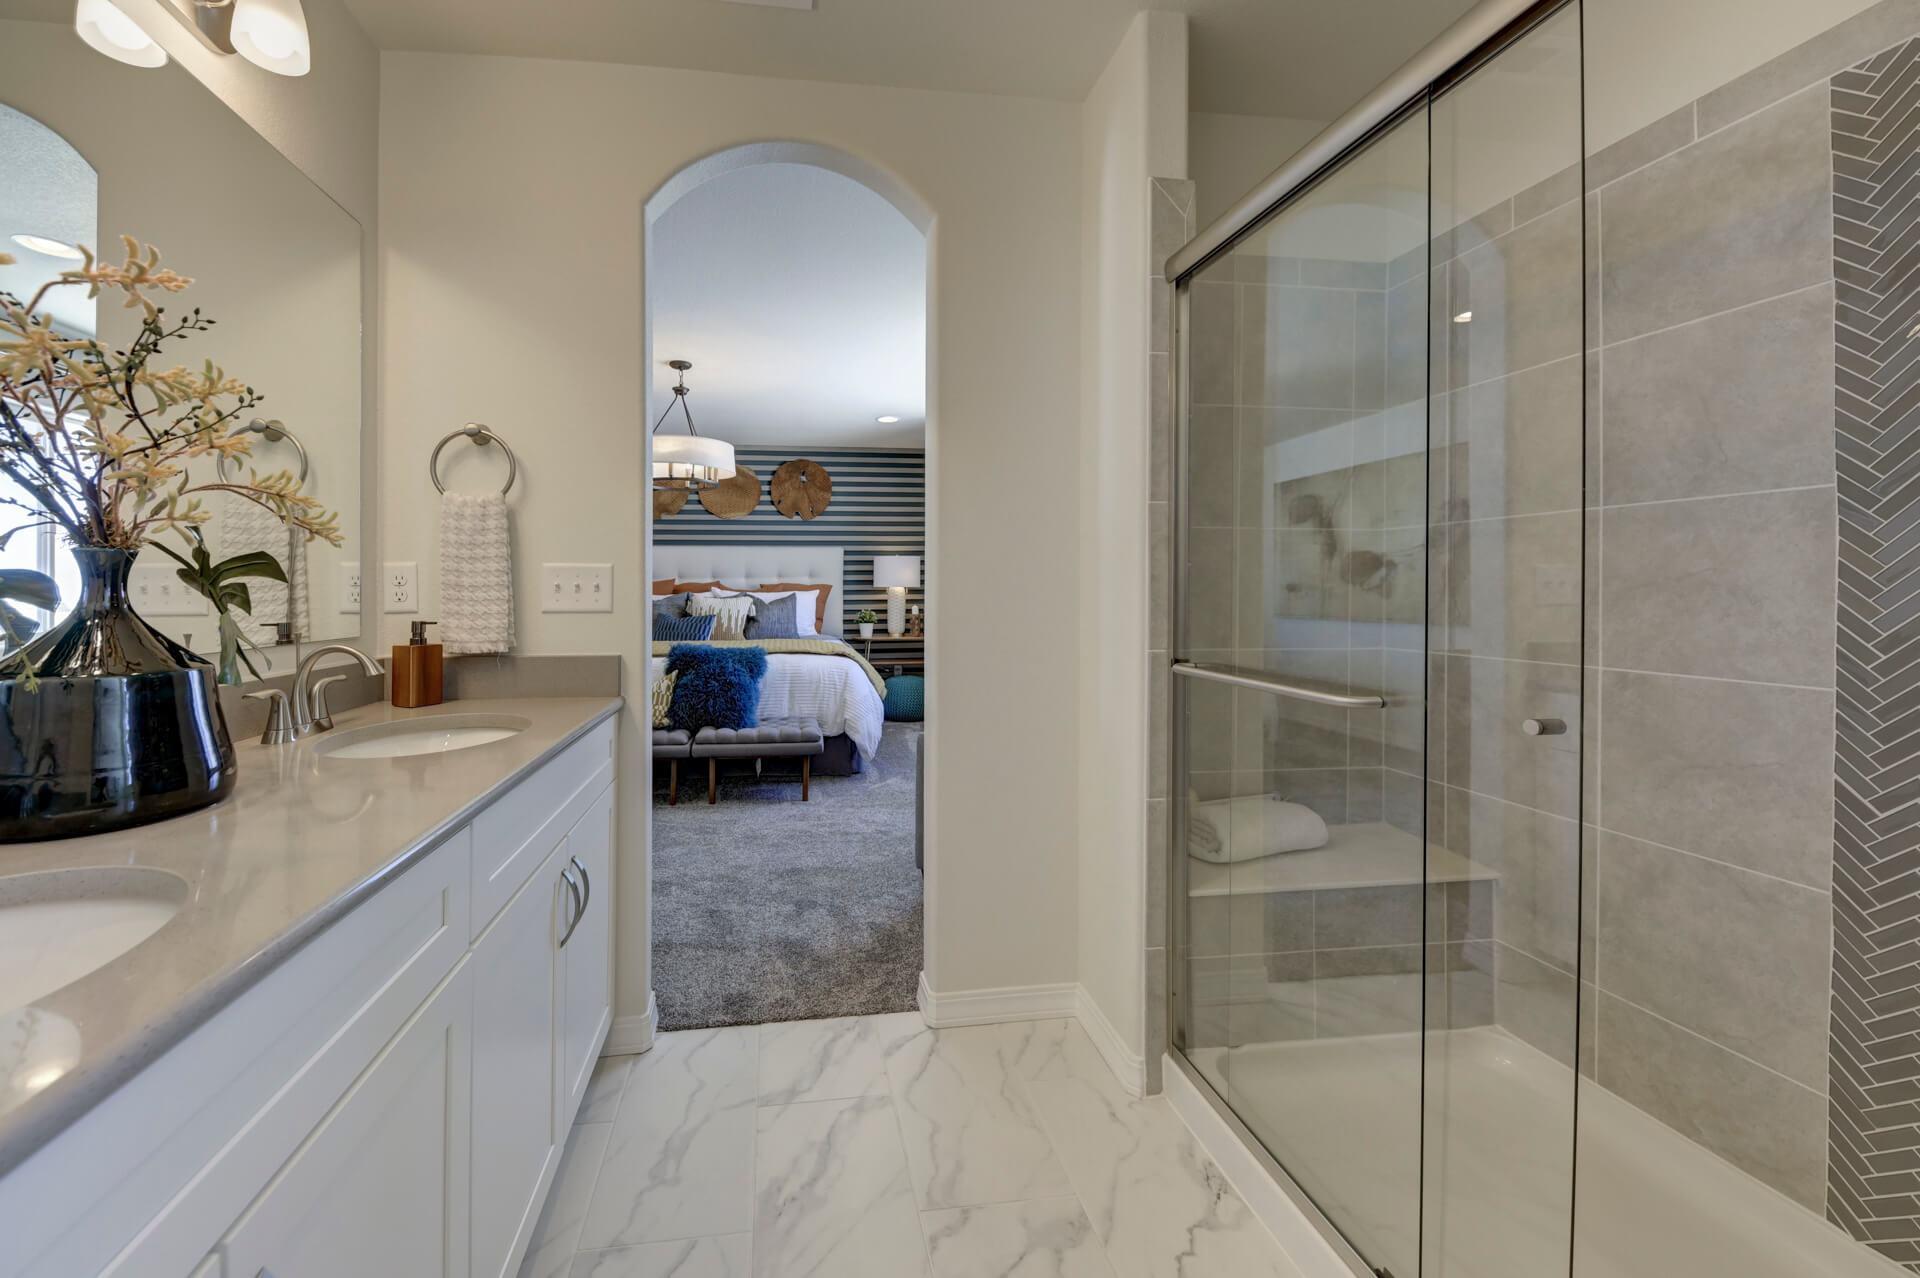 Bathroom featured in The Van Buren By Challenger Homes in Colorado Springs, CO